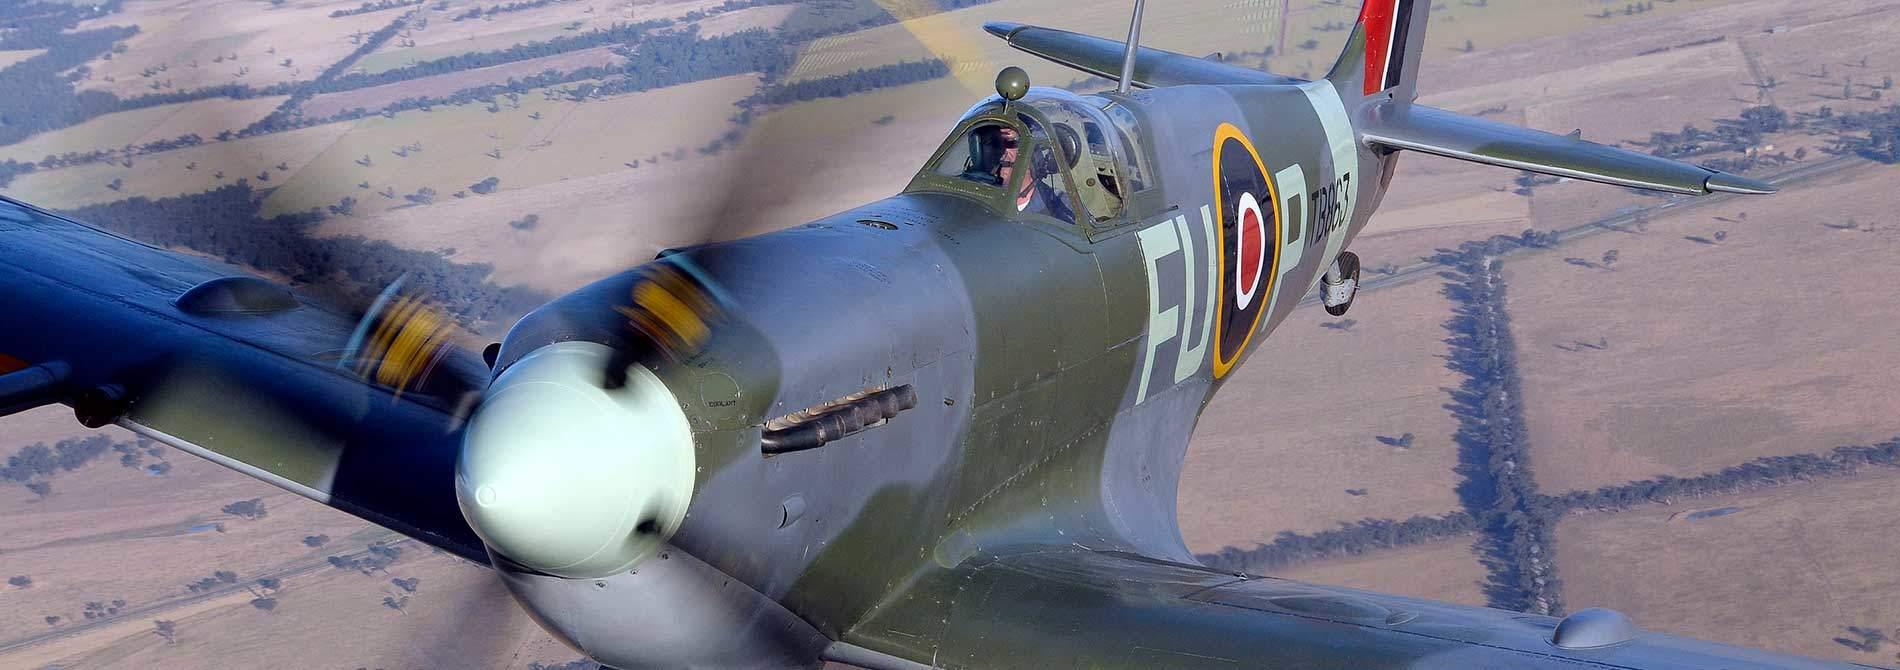 Supermarine Spitfire Mk XVI